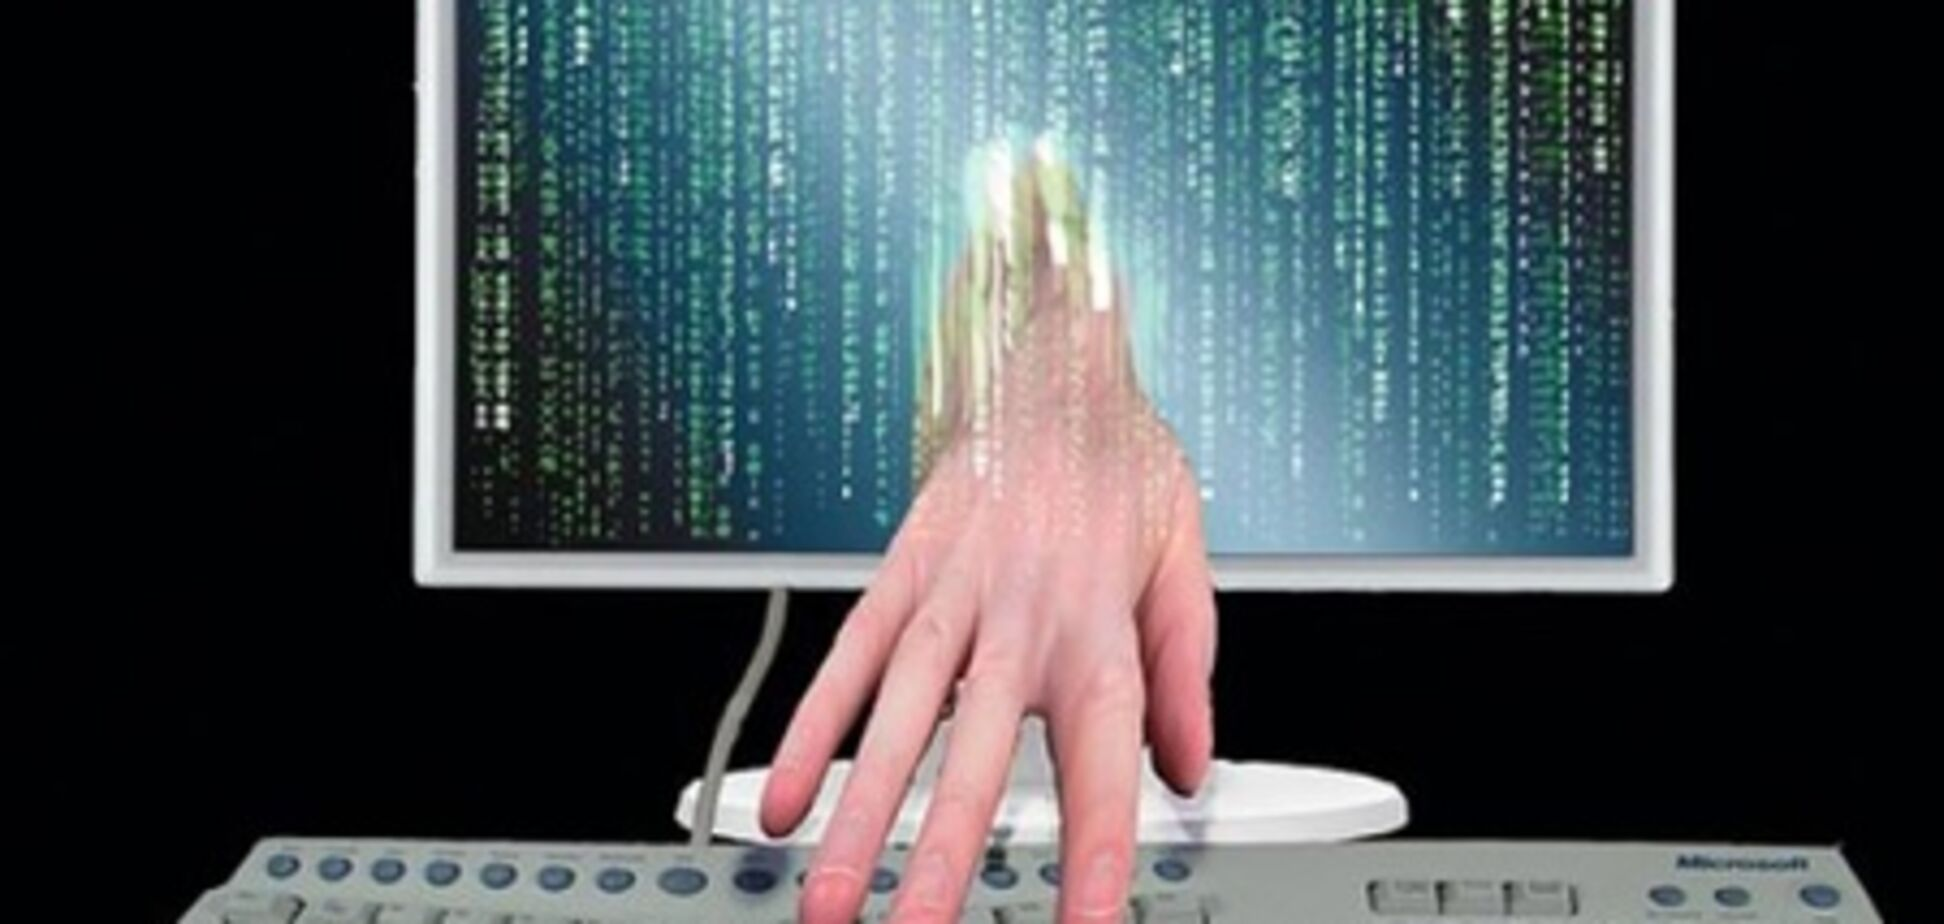 Бойкот хакеров обвалил акции eBay